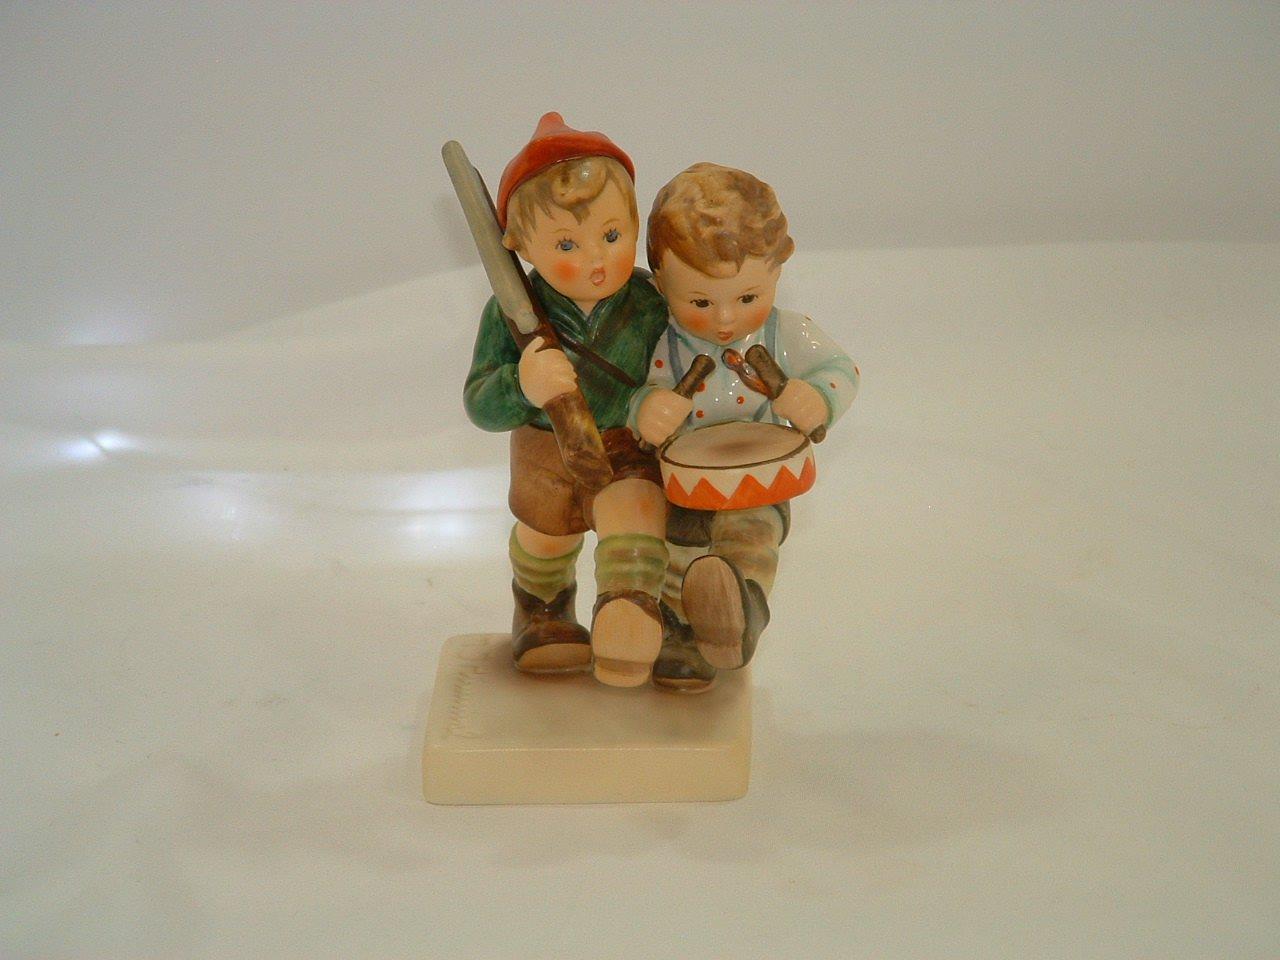 Vintage Hummel Goebel Germany Volunteers Figurine Desert Storm/Desert Shield